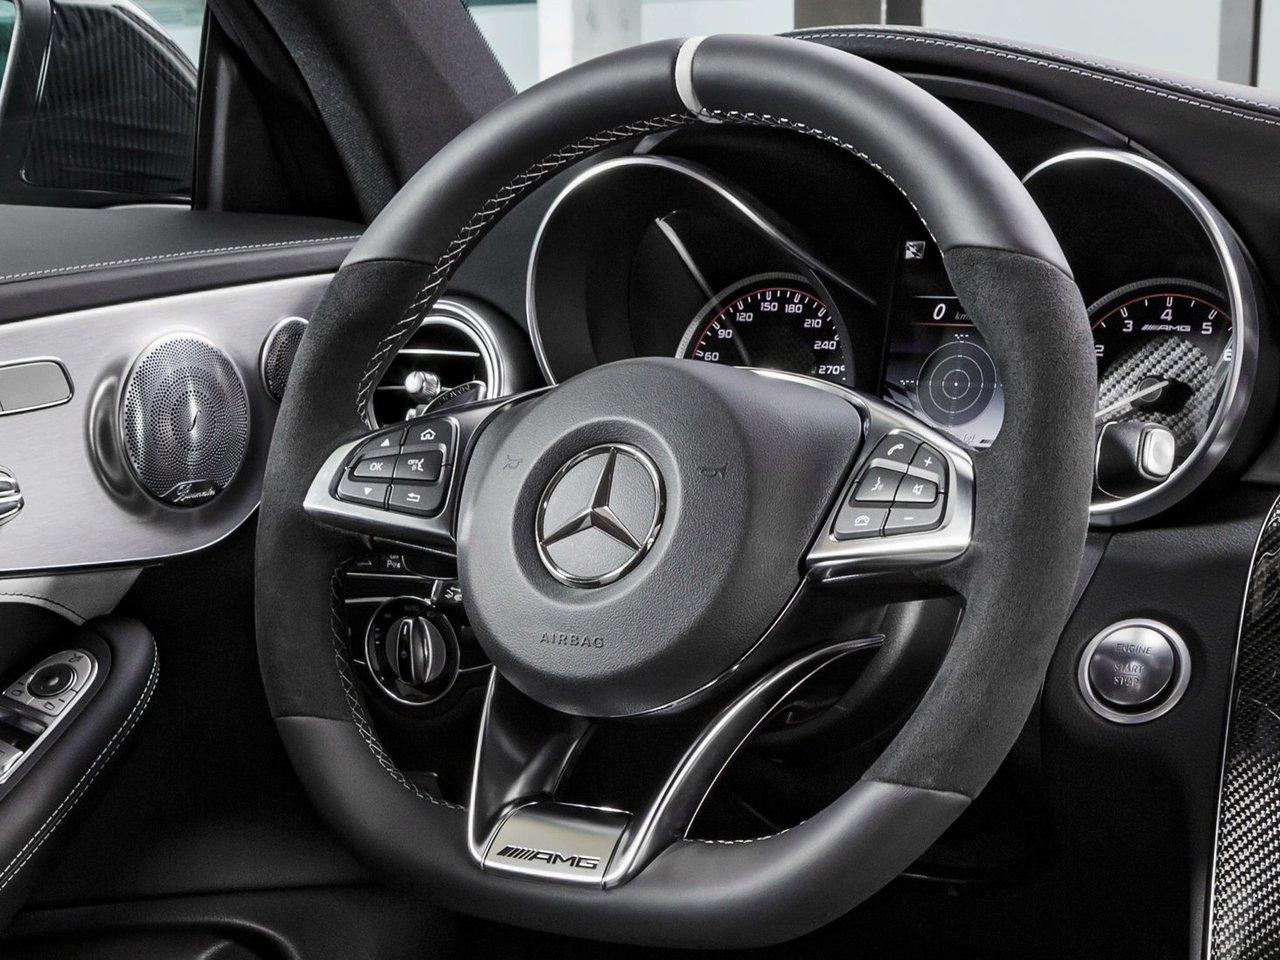 Снимки: Mercedes-benz C-klasse AMG Coupe (W205)